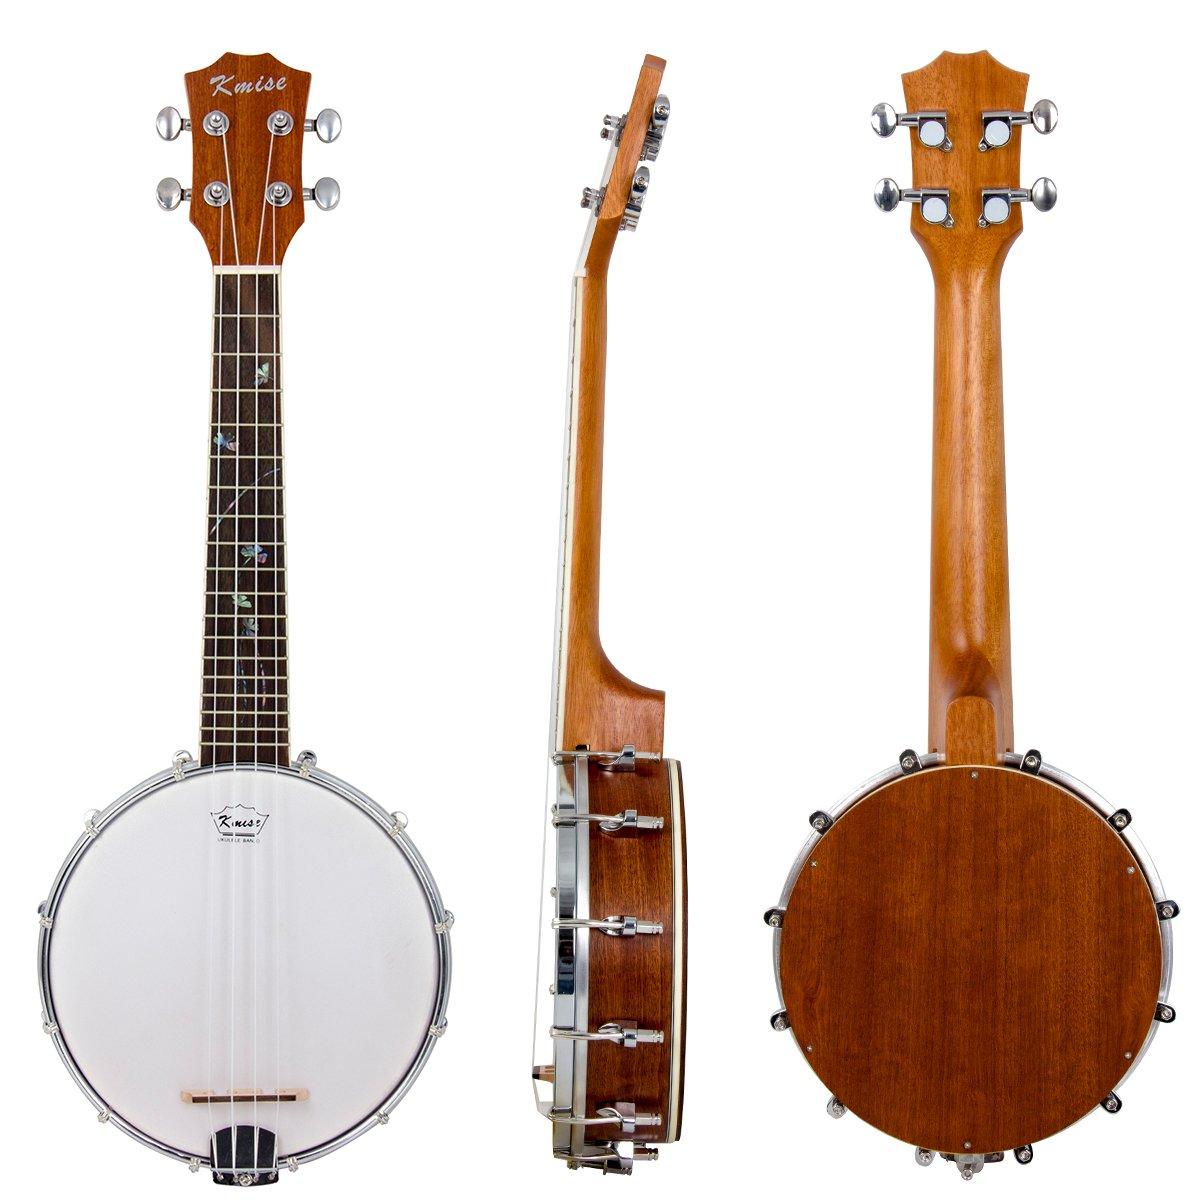 Kmise Banjo-Ukulele mit 4Saiten für Konzerte, 58,4cm, aus Sapeli-Holz Concert 23 inch MI2099 4cm Ltd